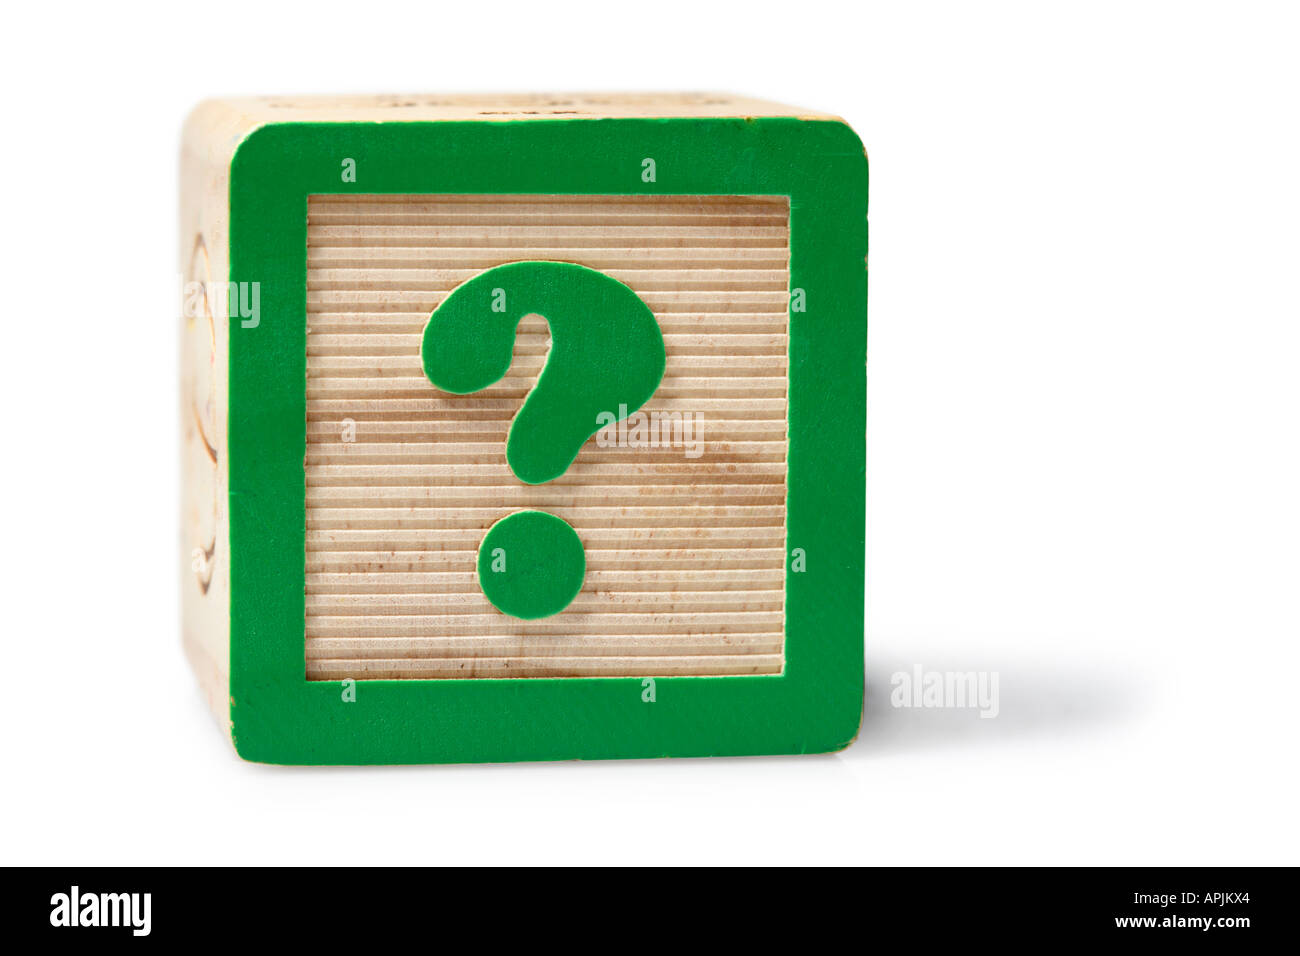 Question Mark Block - Stock Image